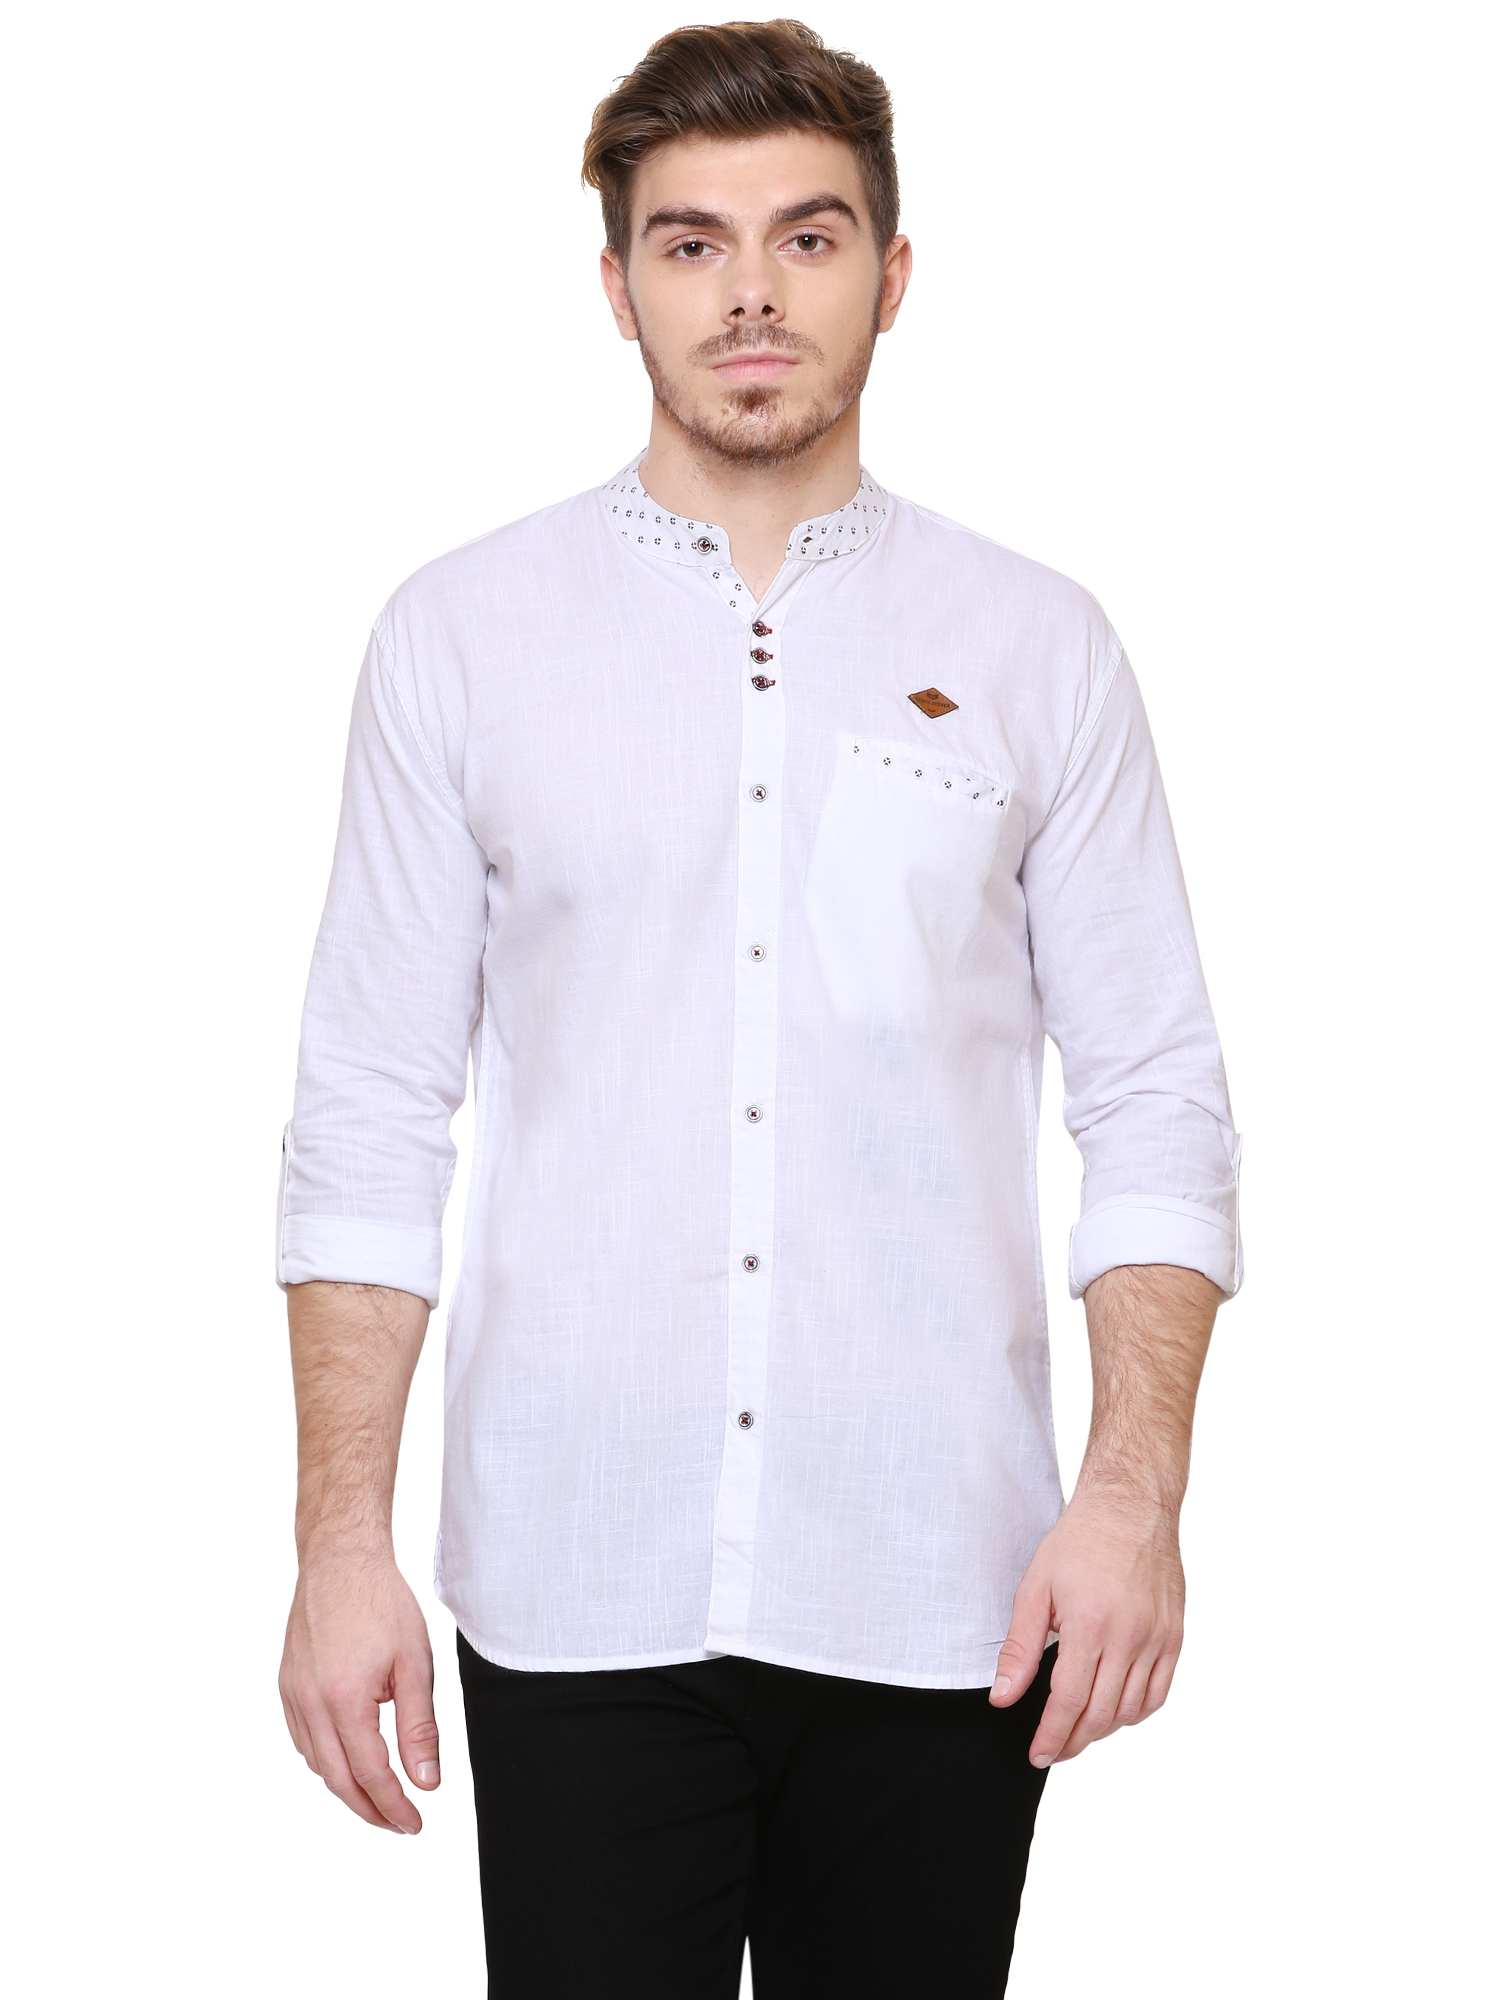 Kuons Avenue | Kuons Avenue Men's White Linen Cotton Shirt- KACLFS1167WH